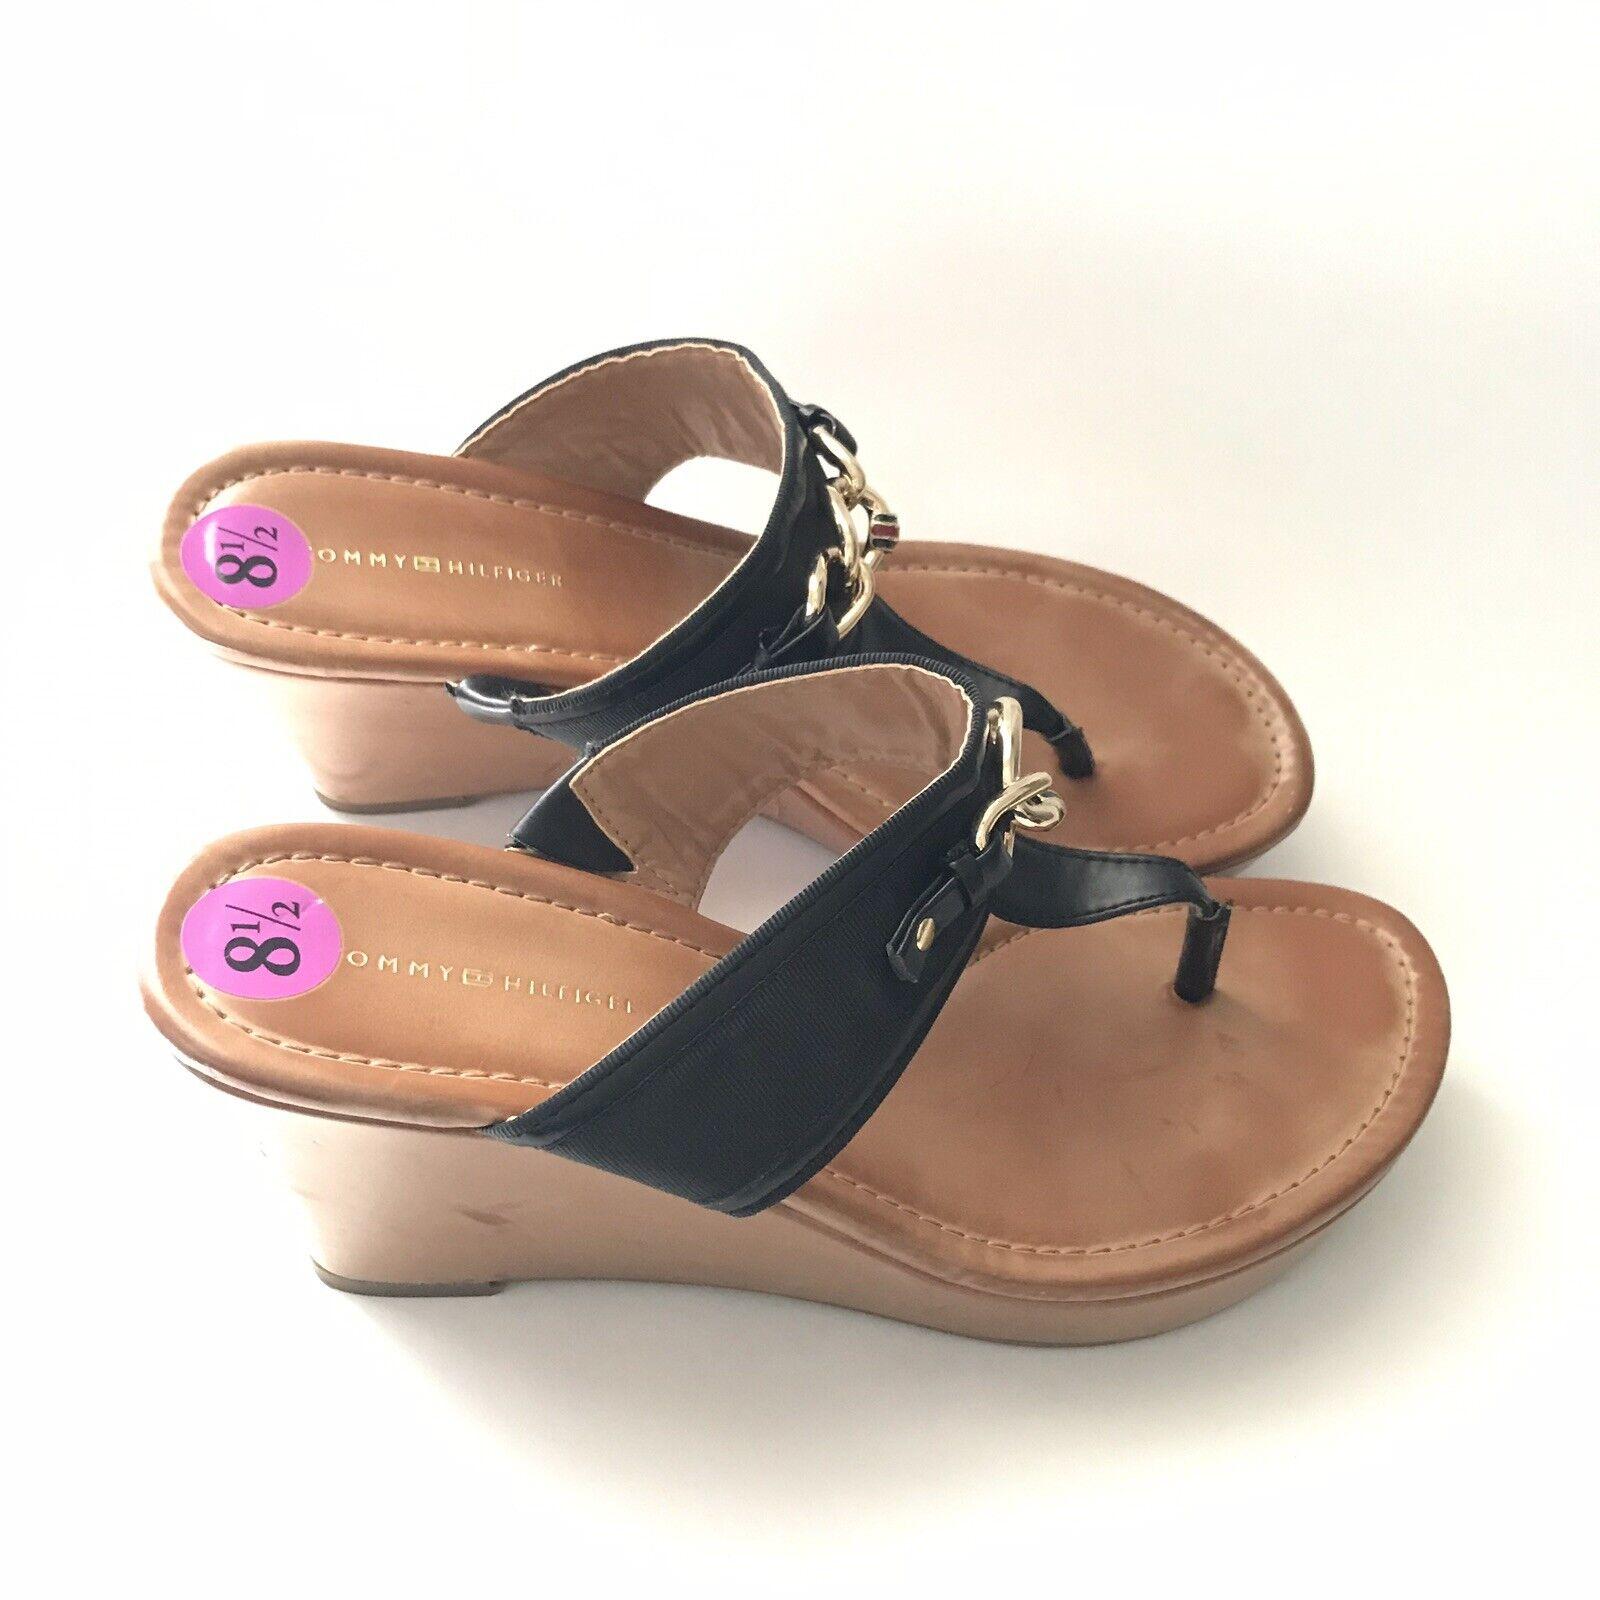 tommy hilfiger Womens Sandal Size 8.5M Melane Tho… - image 9